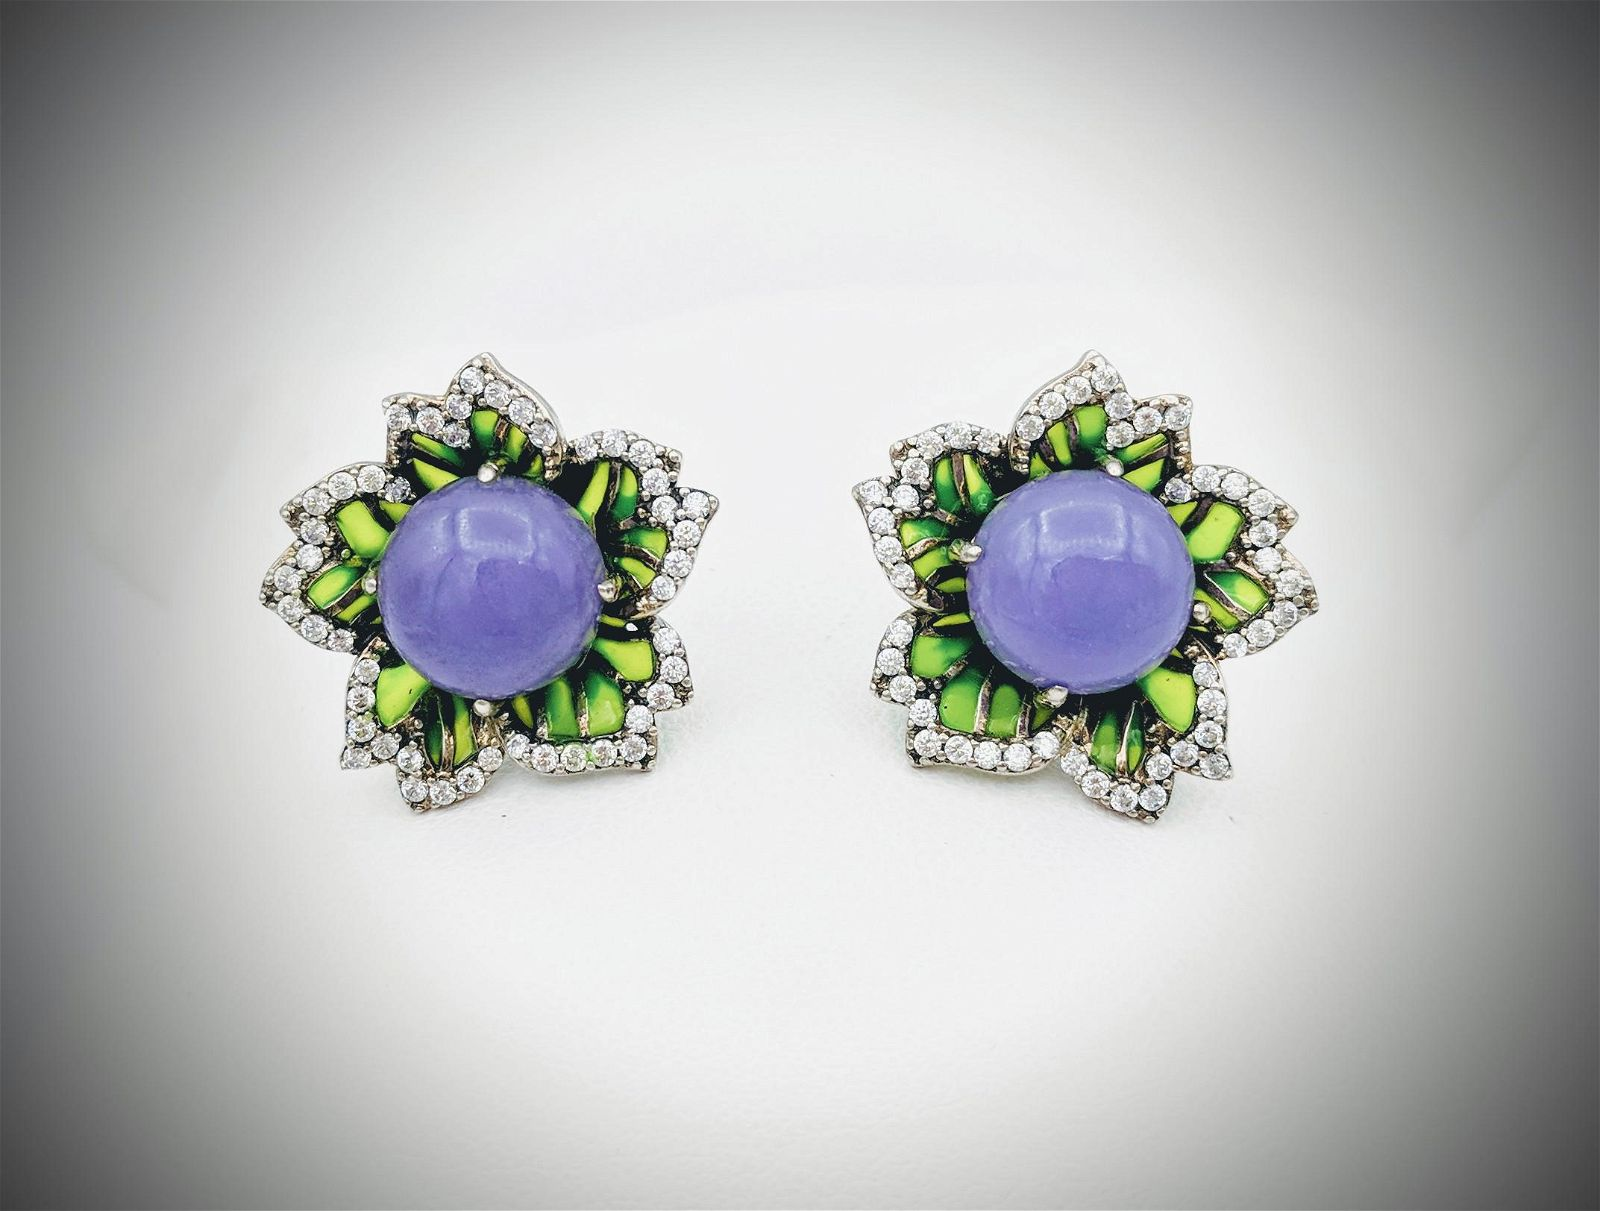 Flowering Violet Jade Earrings w CZs and Green